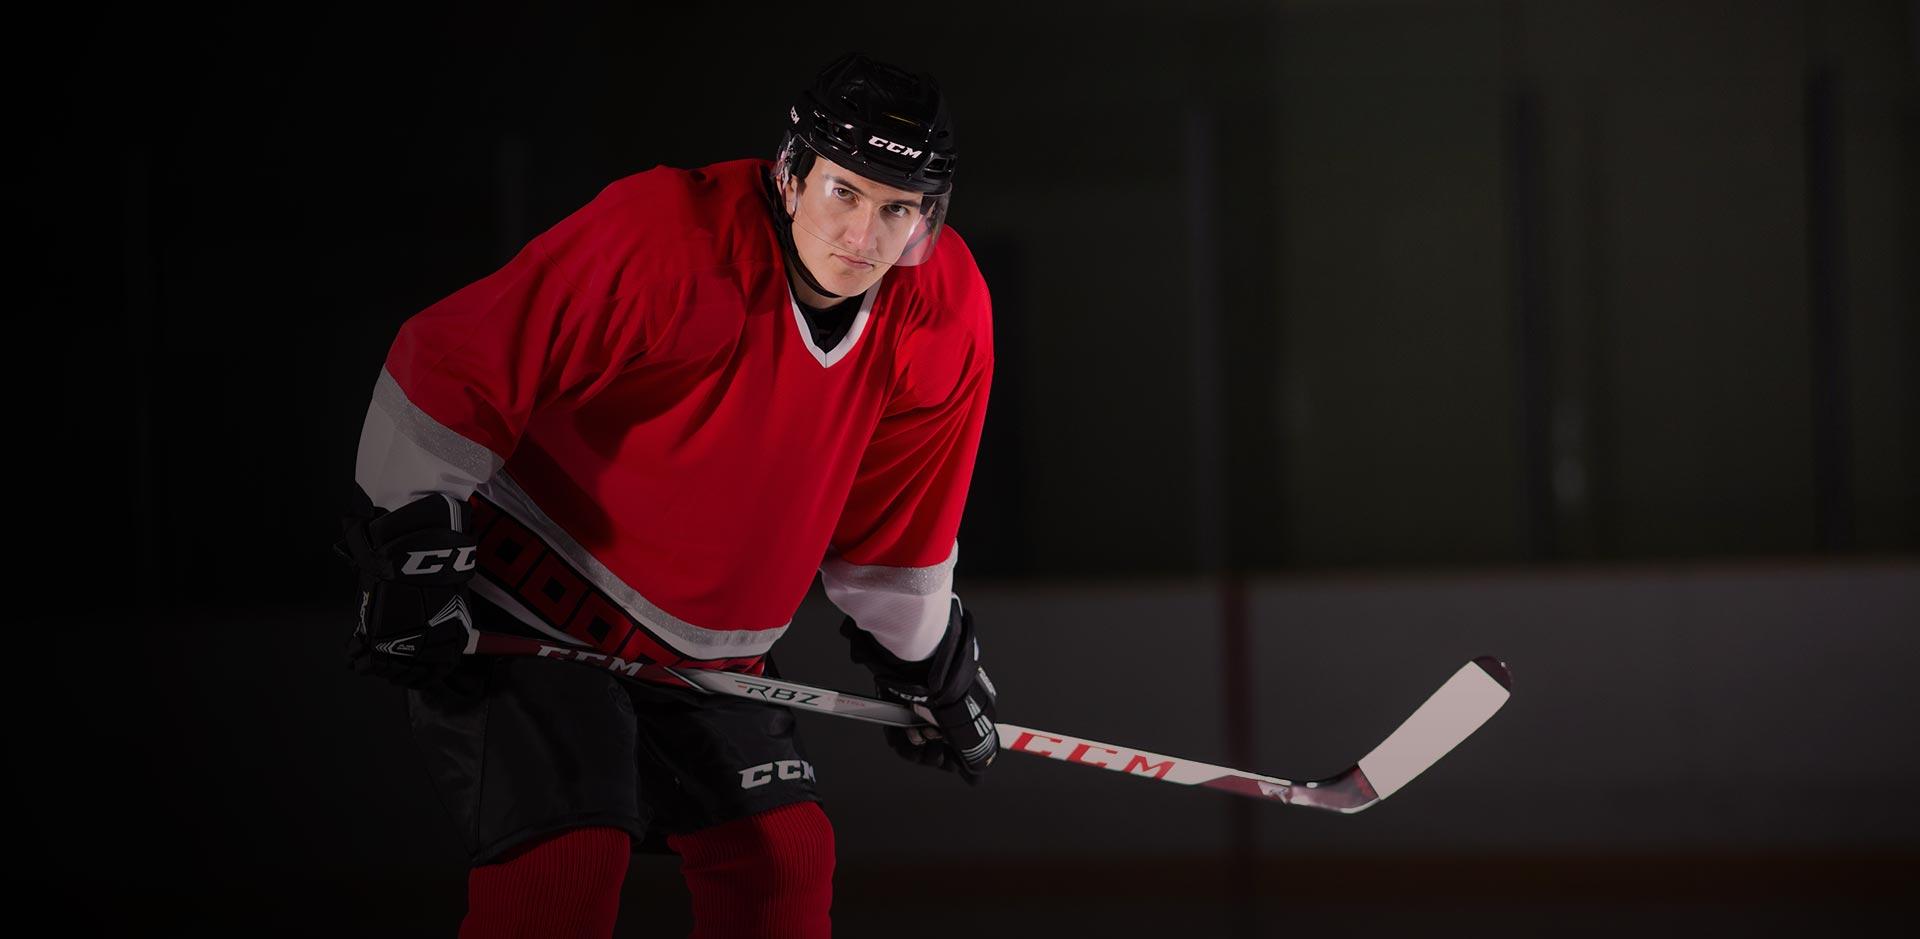 New Hockey Gear for 2017